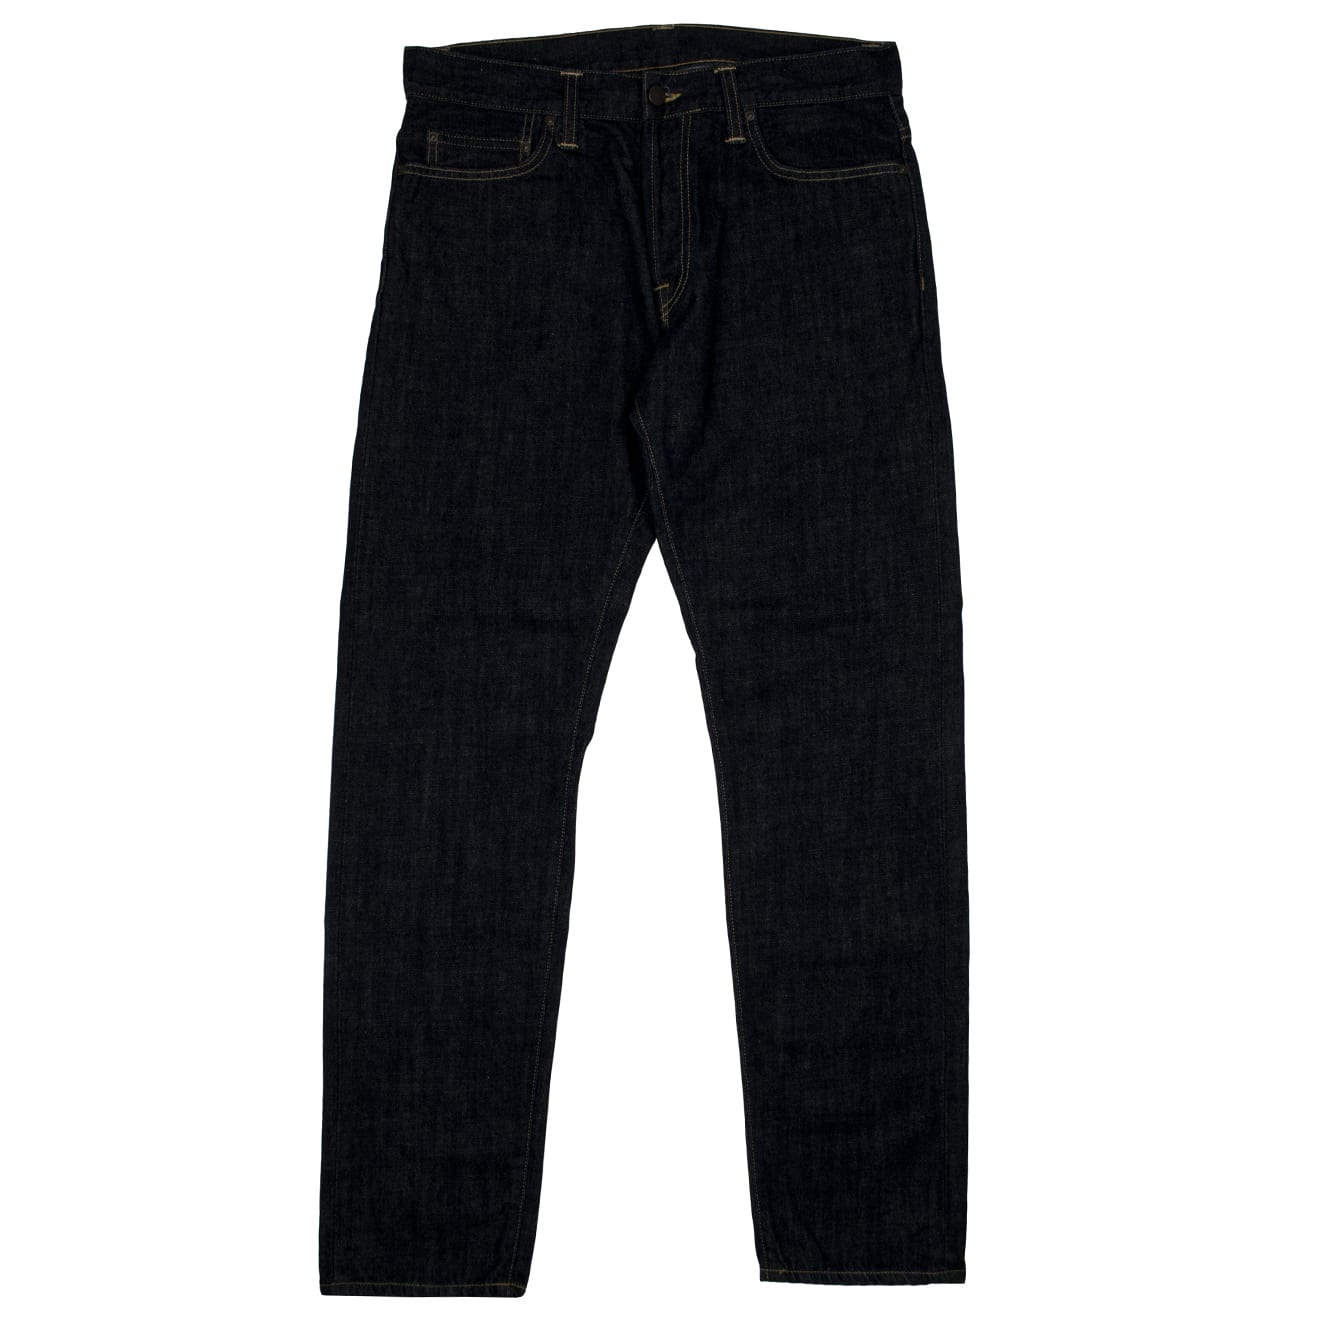 Carhartt klondike reg leg denim jean blue rinsed